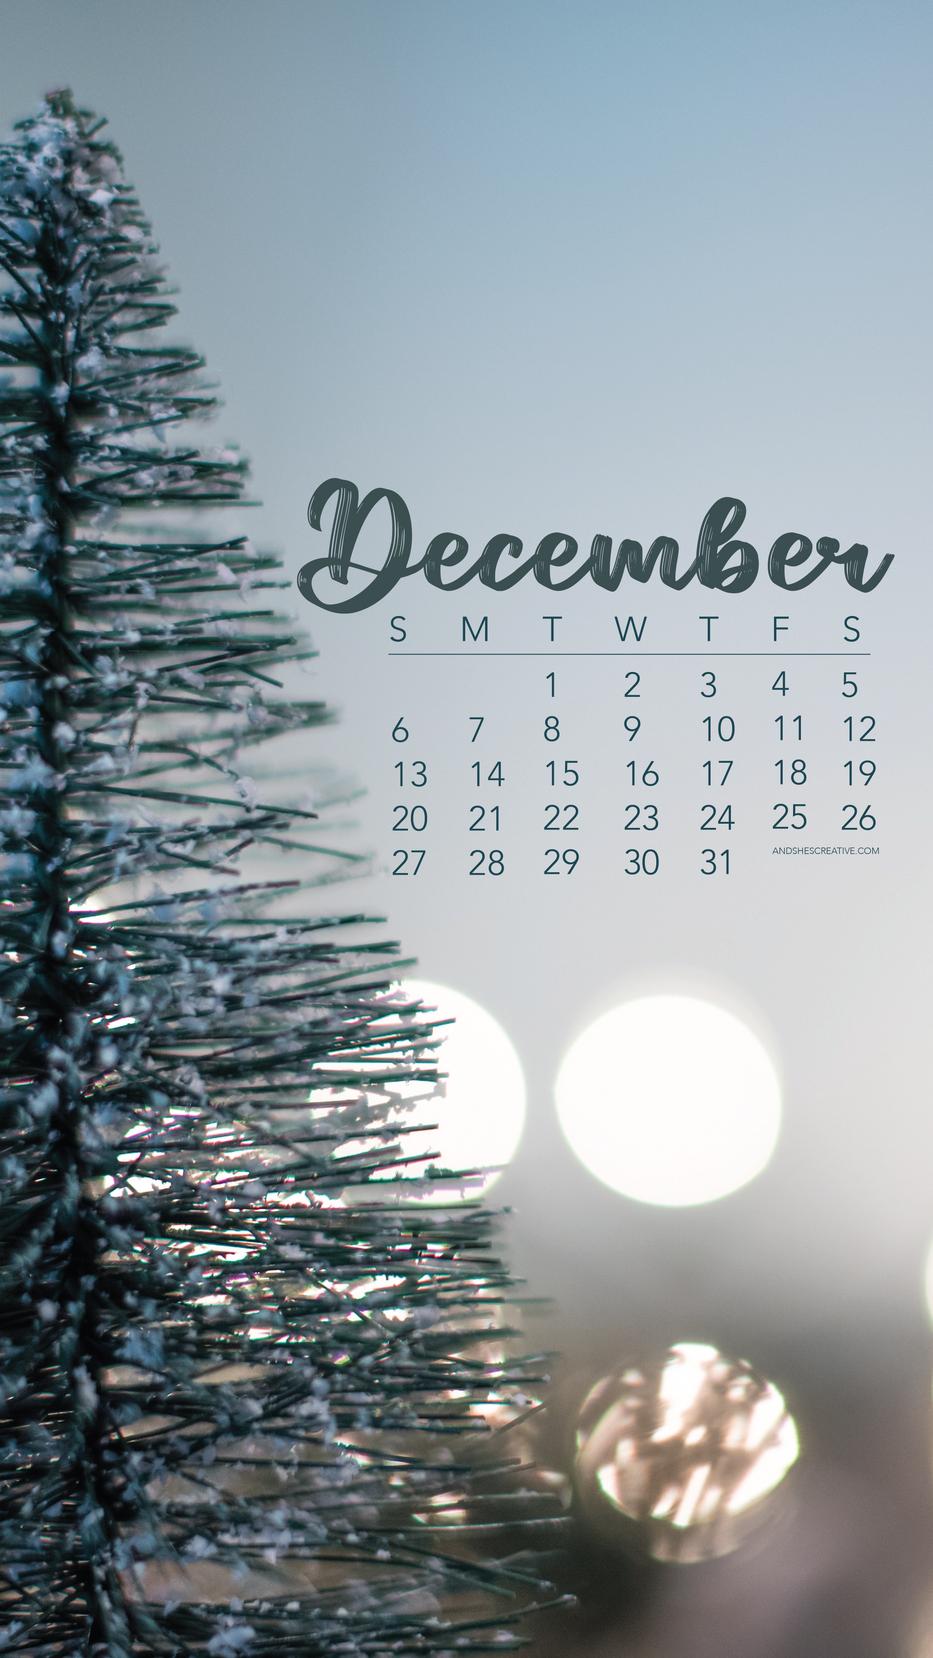 December Christmas Tree Calendar Mobile Background